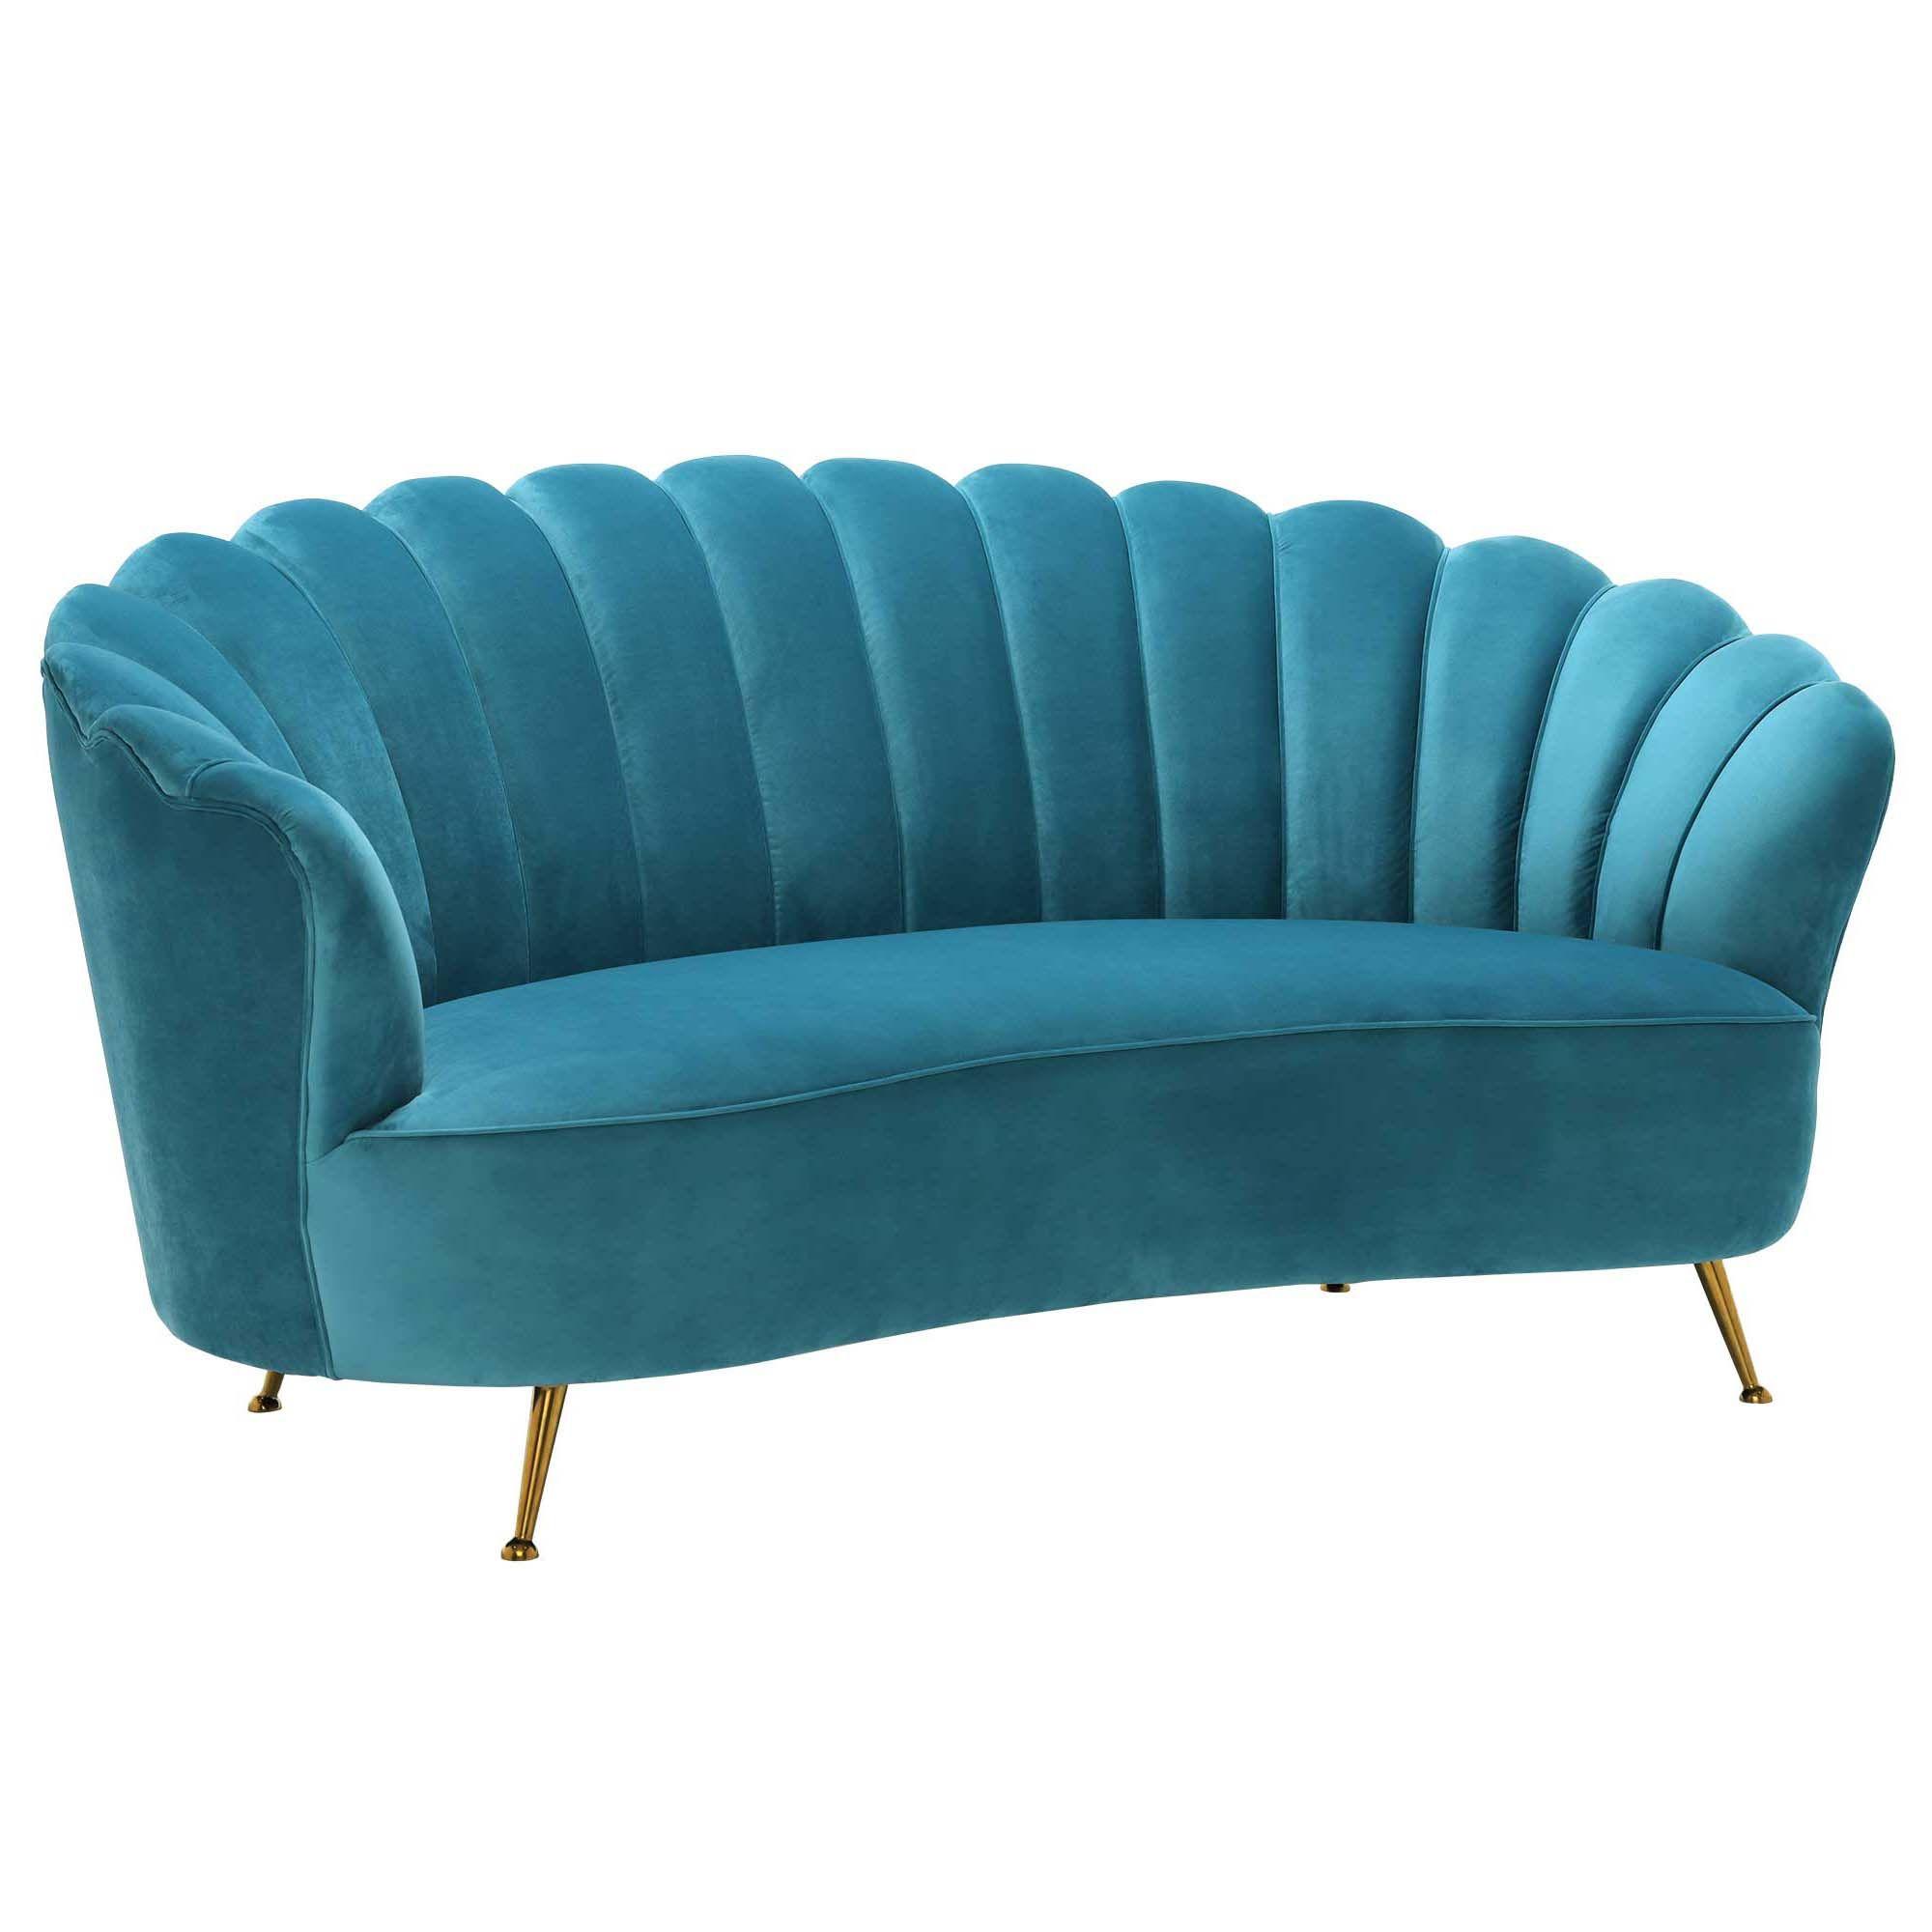 Fairmont Scalloped Art Deco Sofa Blue Art Deco Interior Living